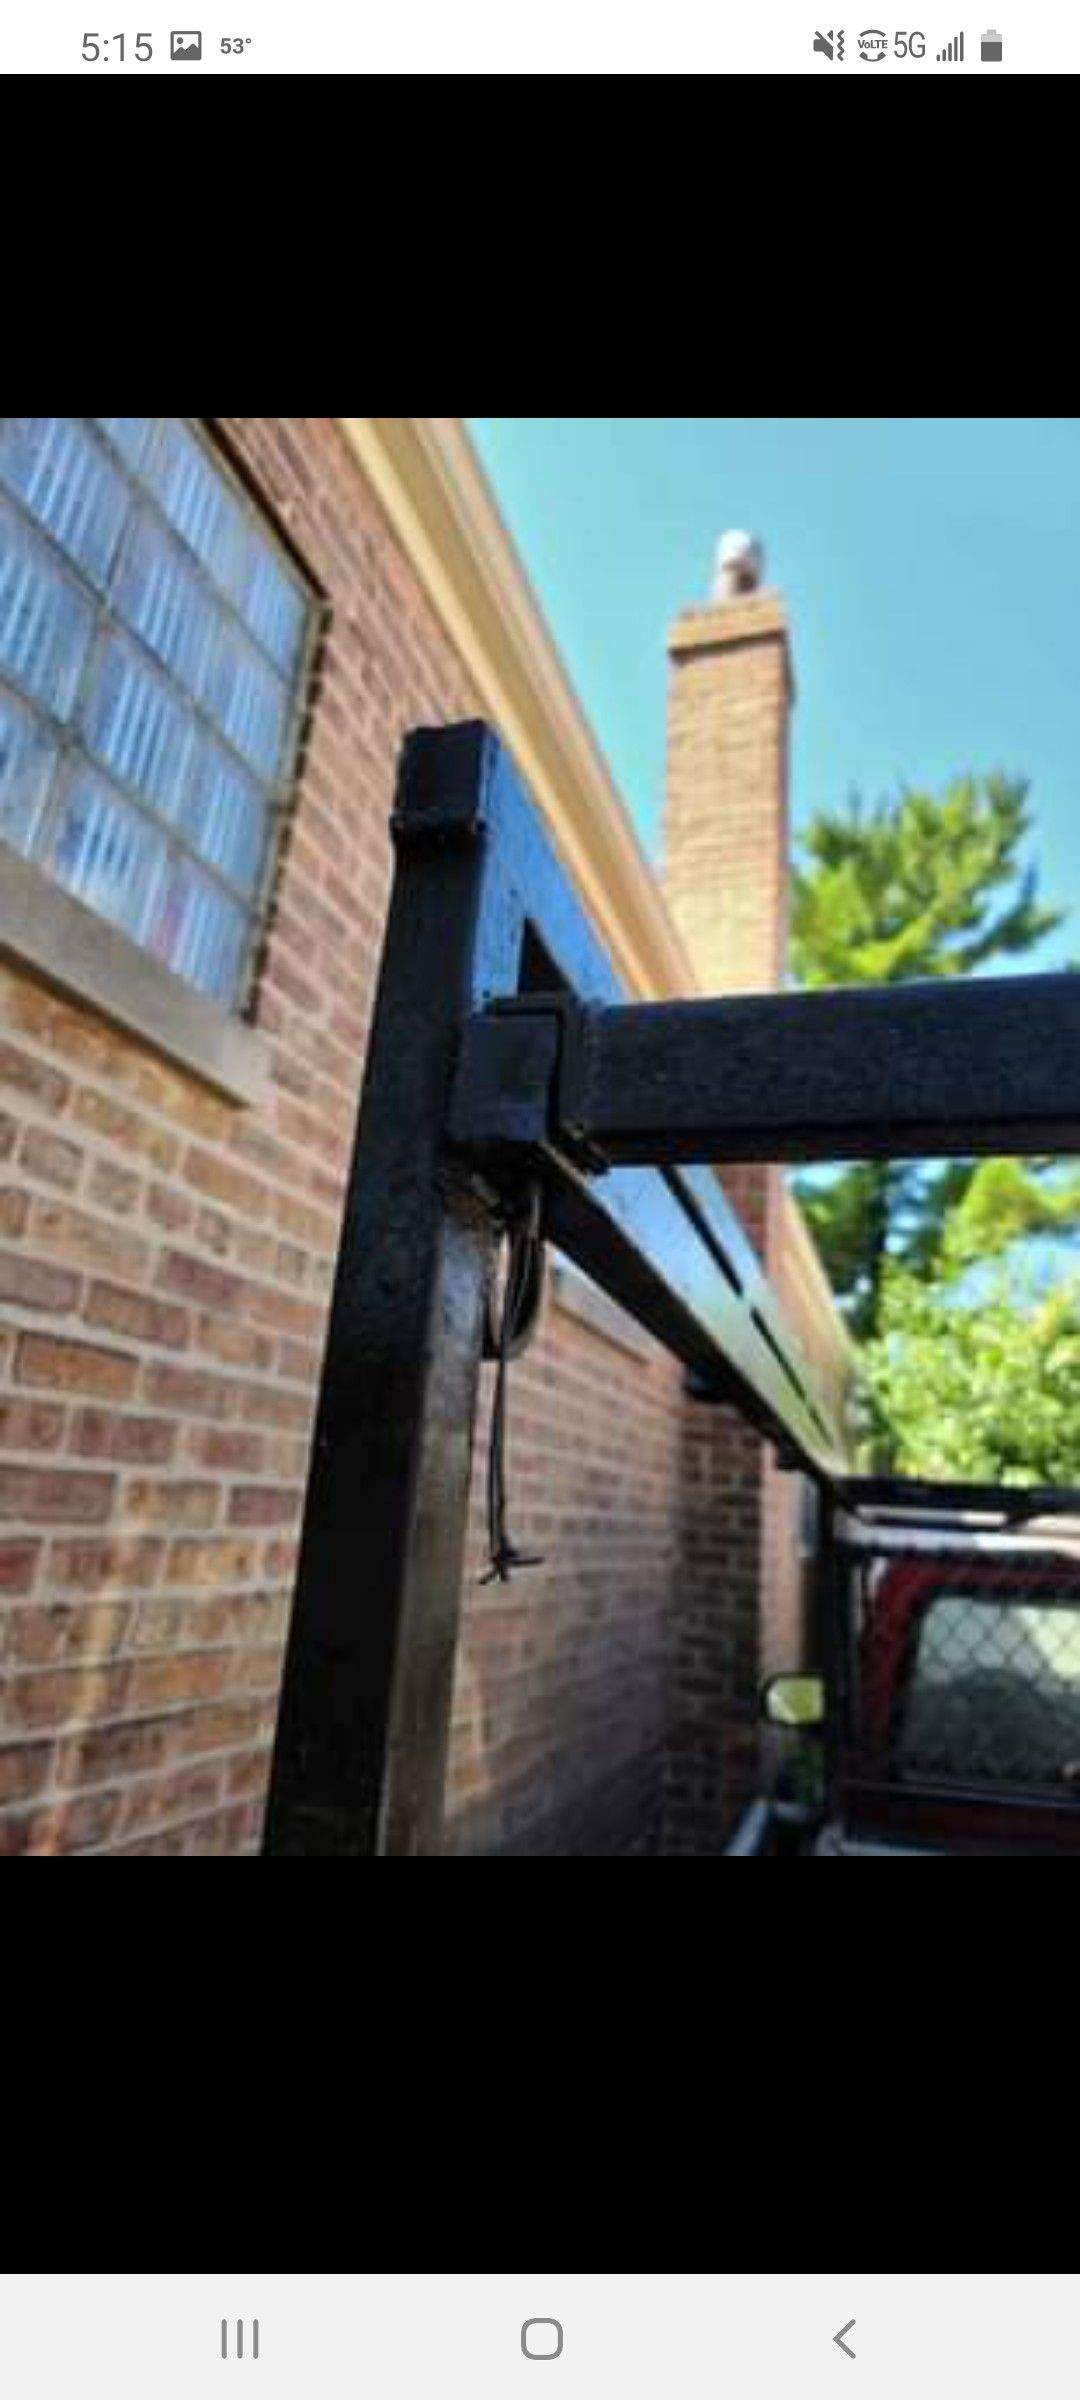 Ladder rack only